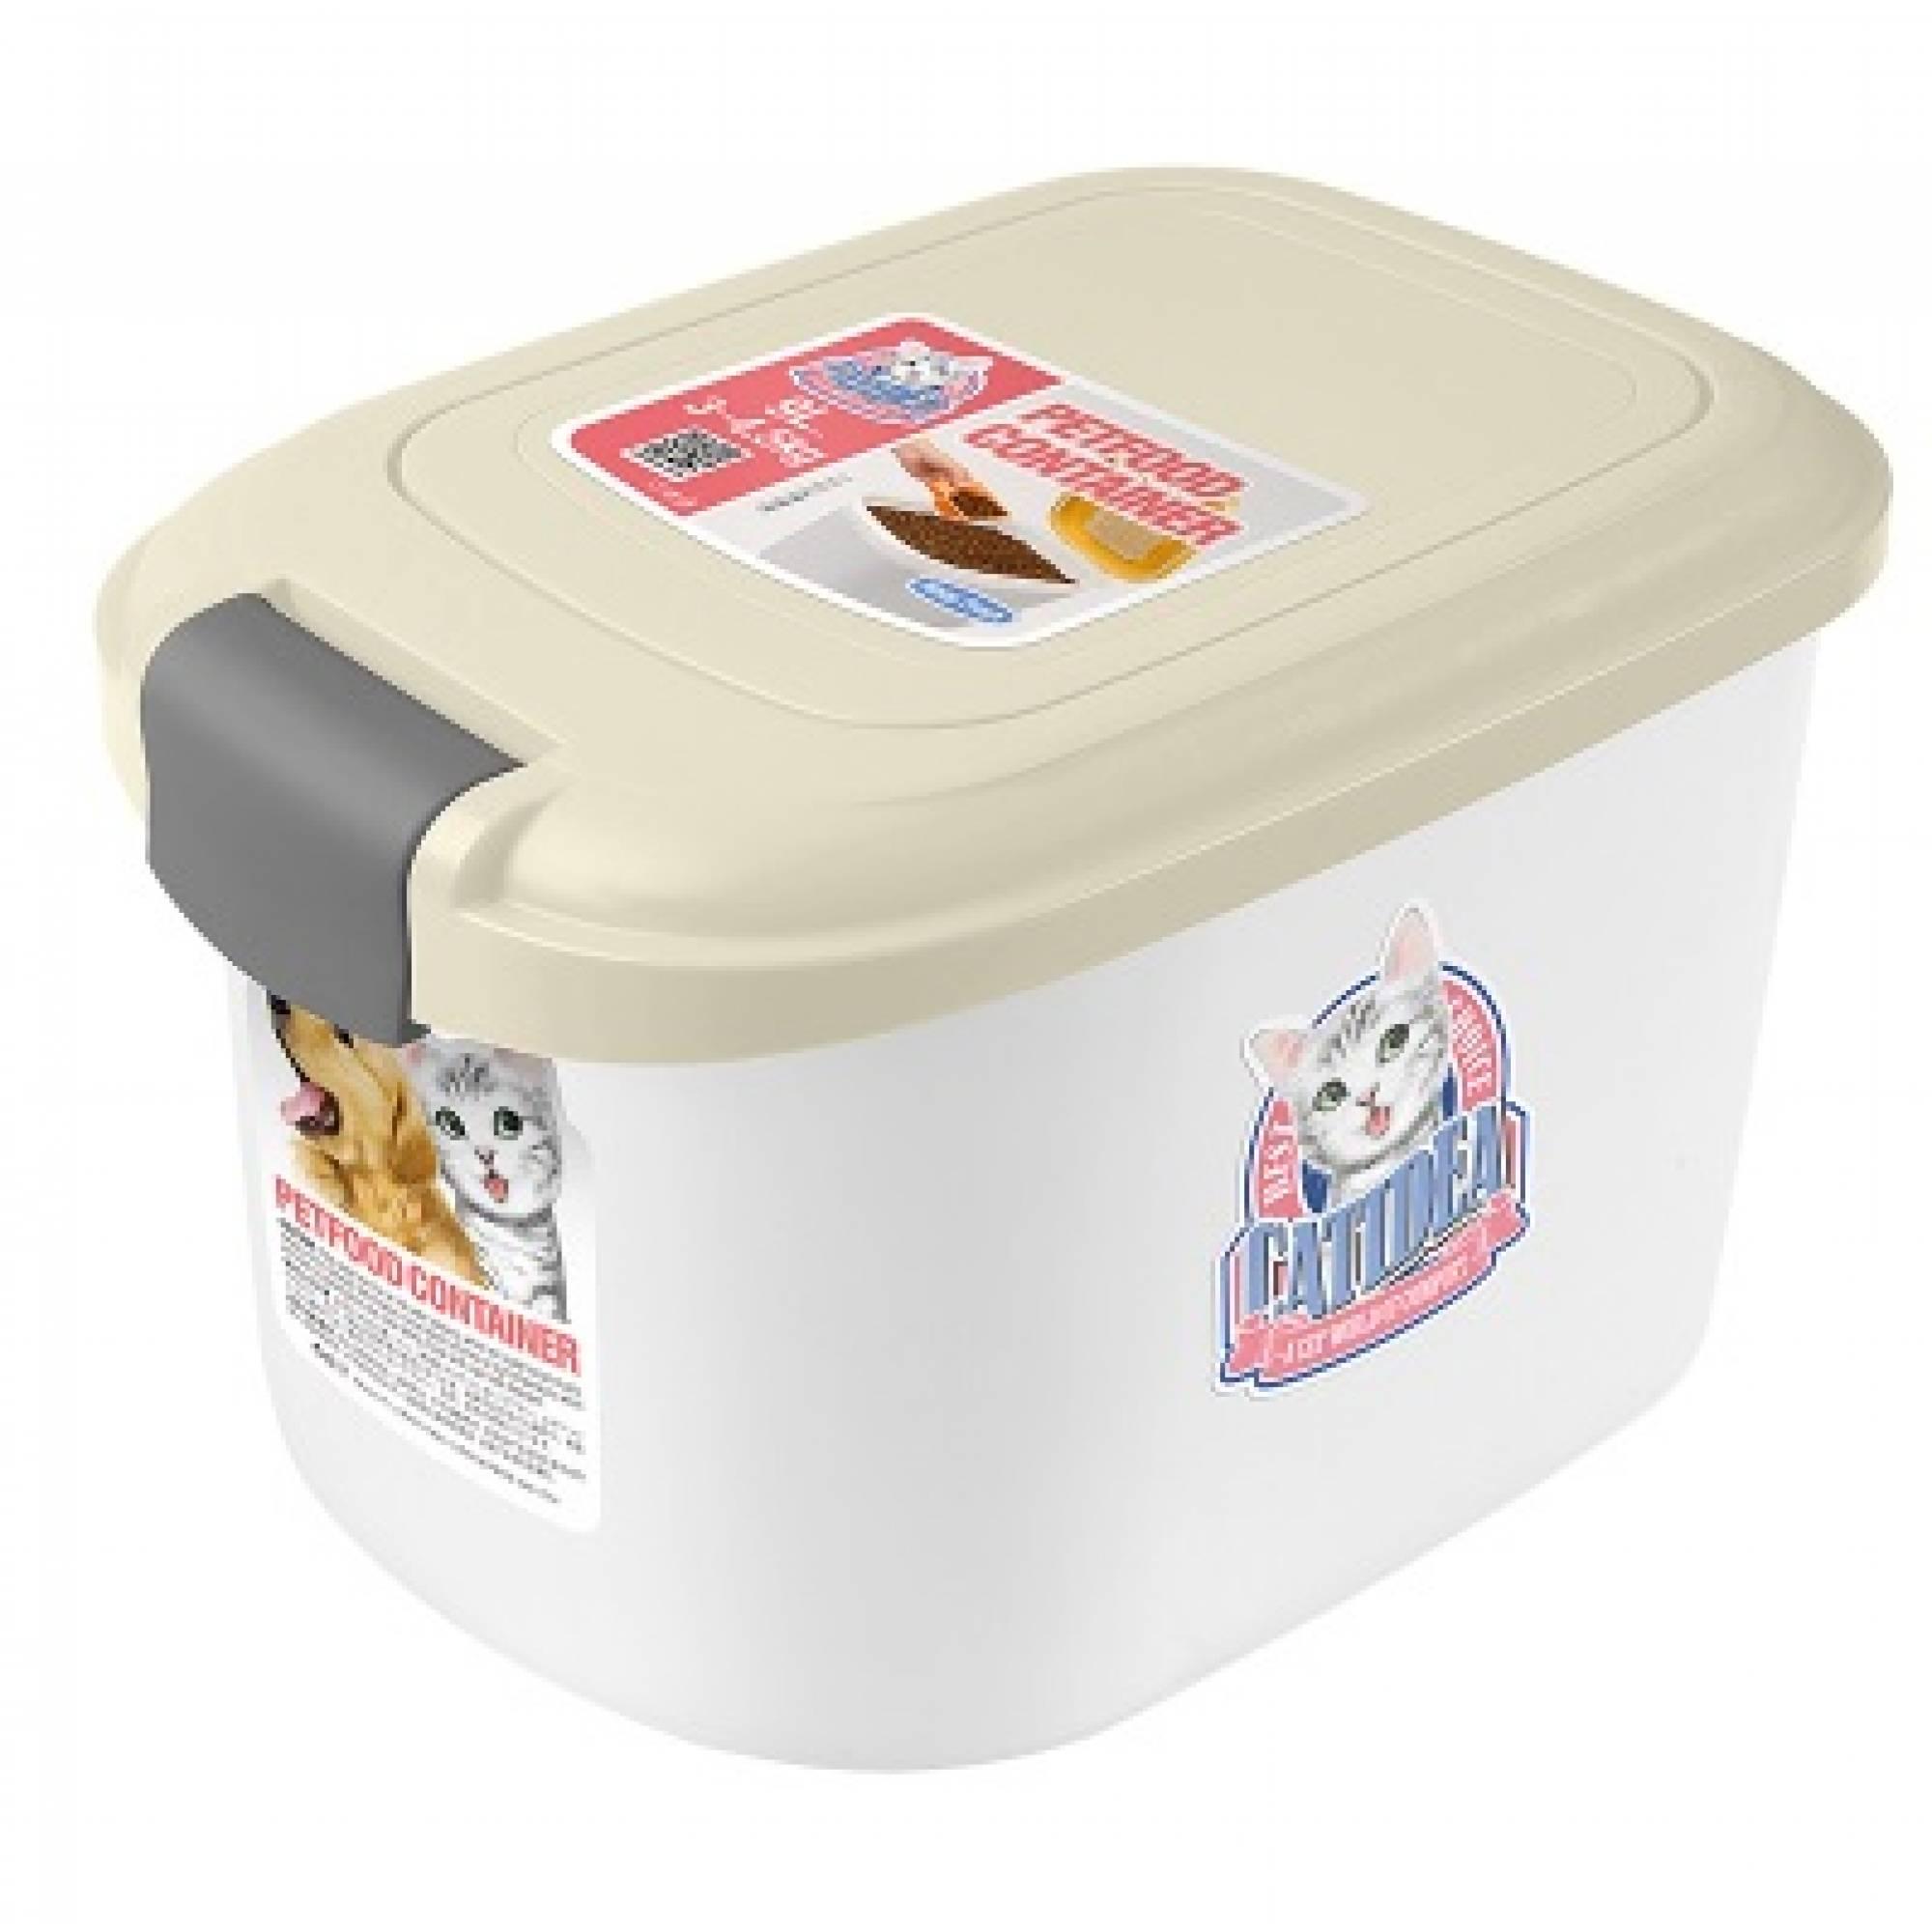 CATIDEA - CF101 Single Open Food Container - 3kg Cream